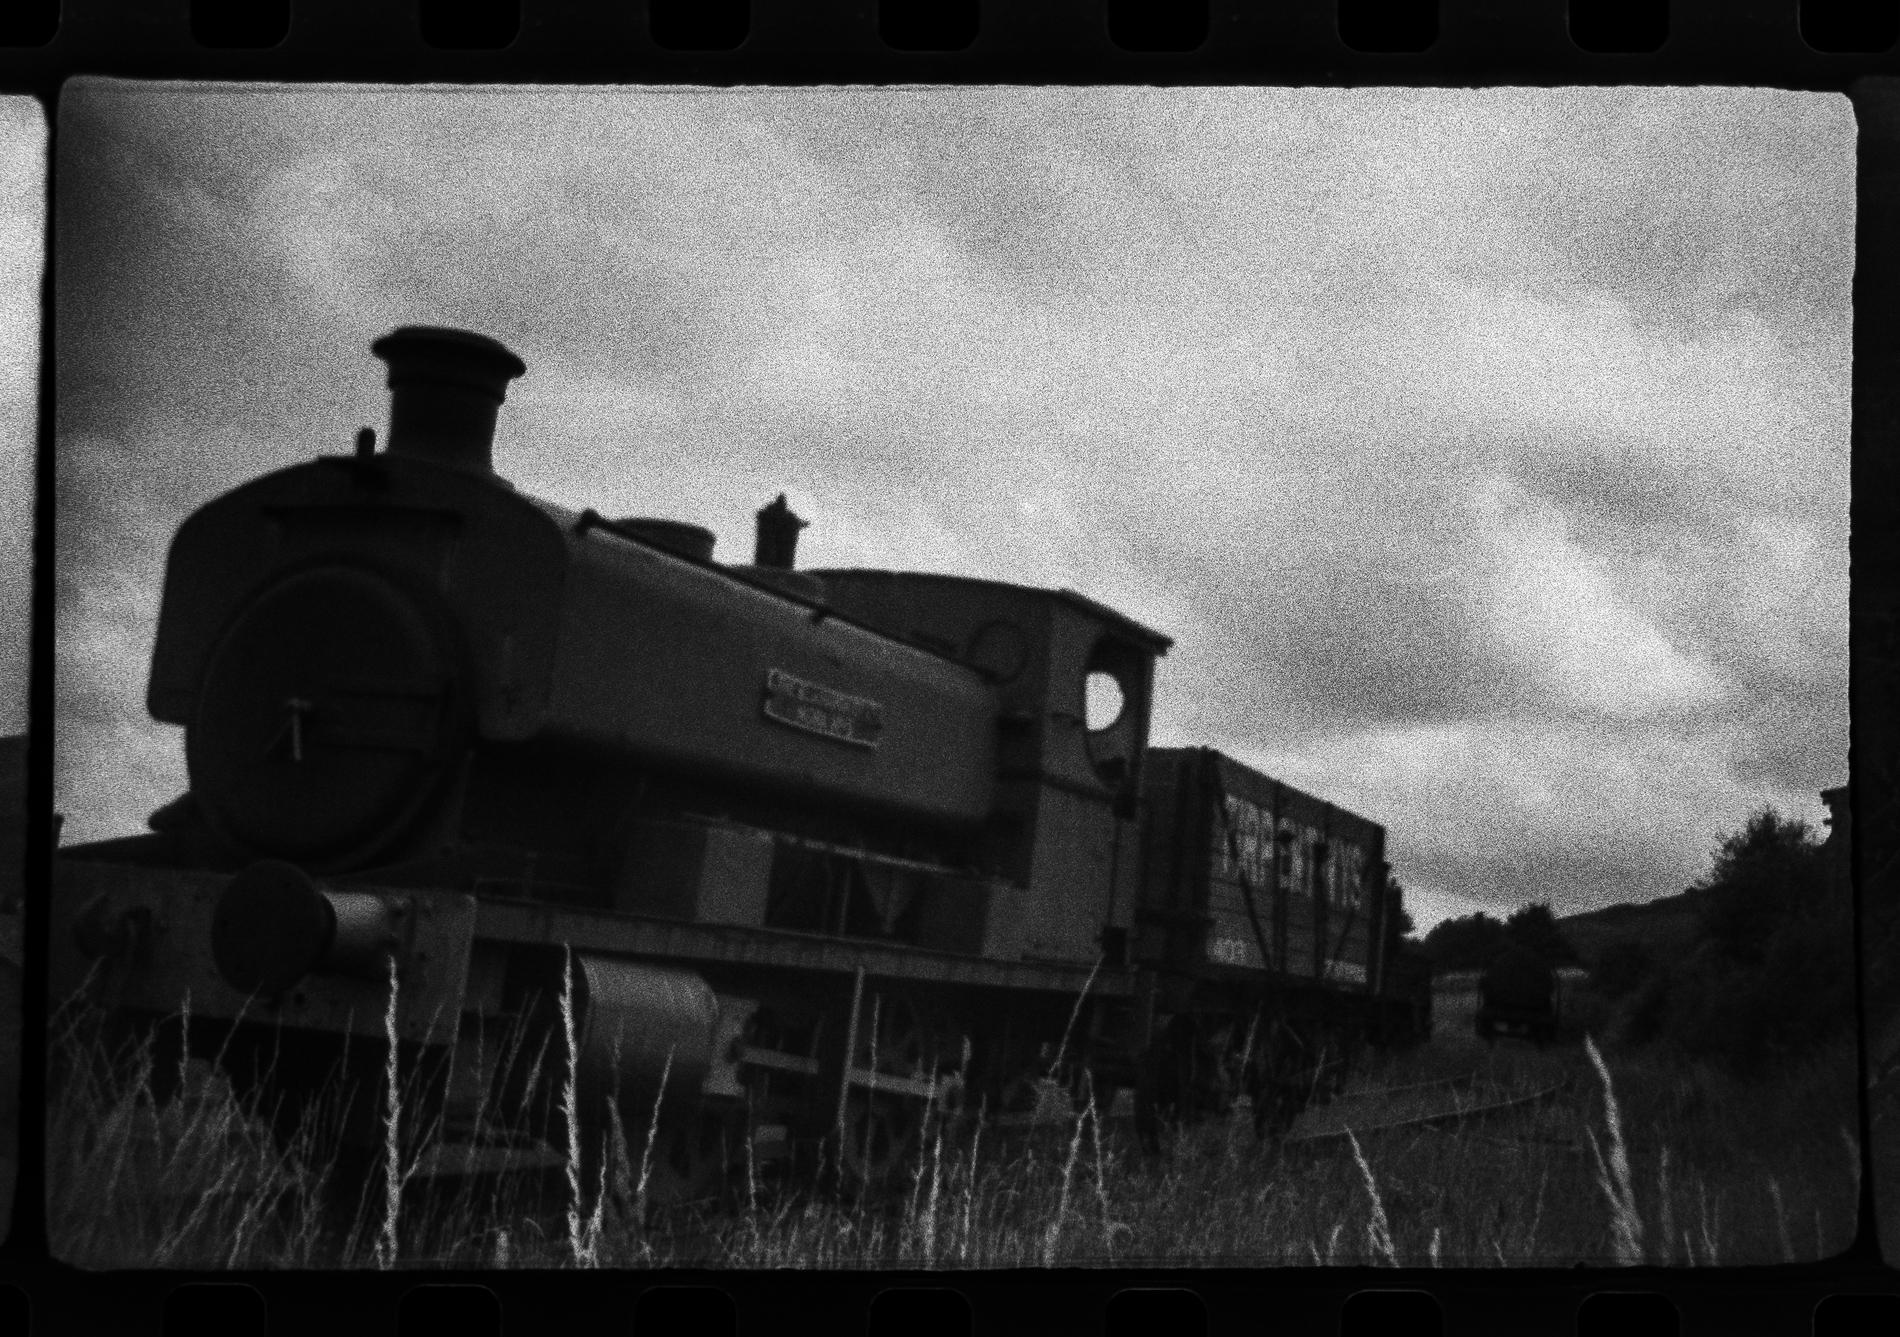 Steam engine and overcast sky (Pic: Toby Van de Velde)